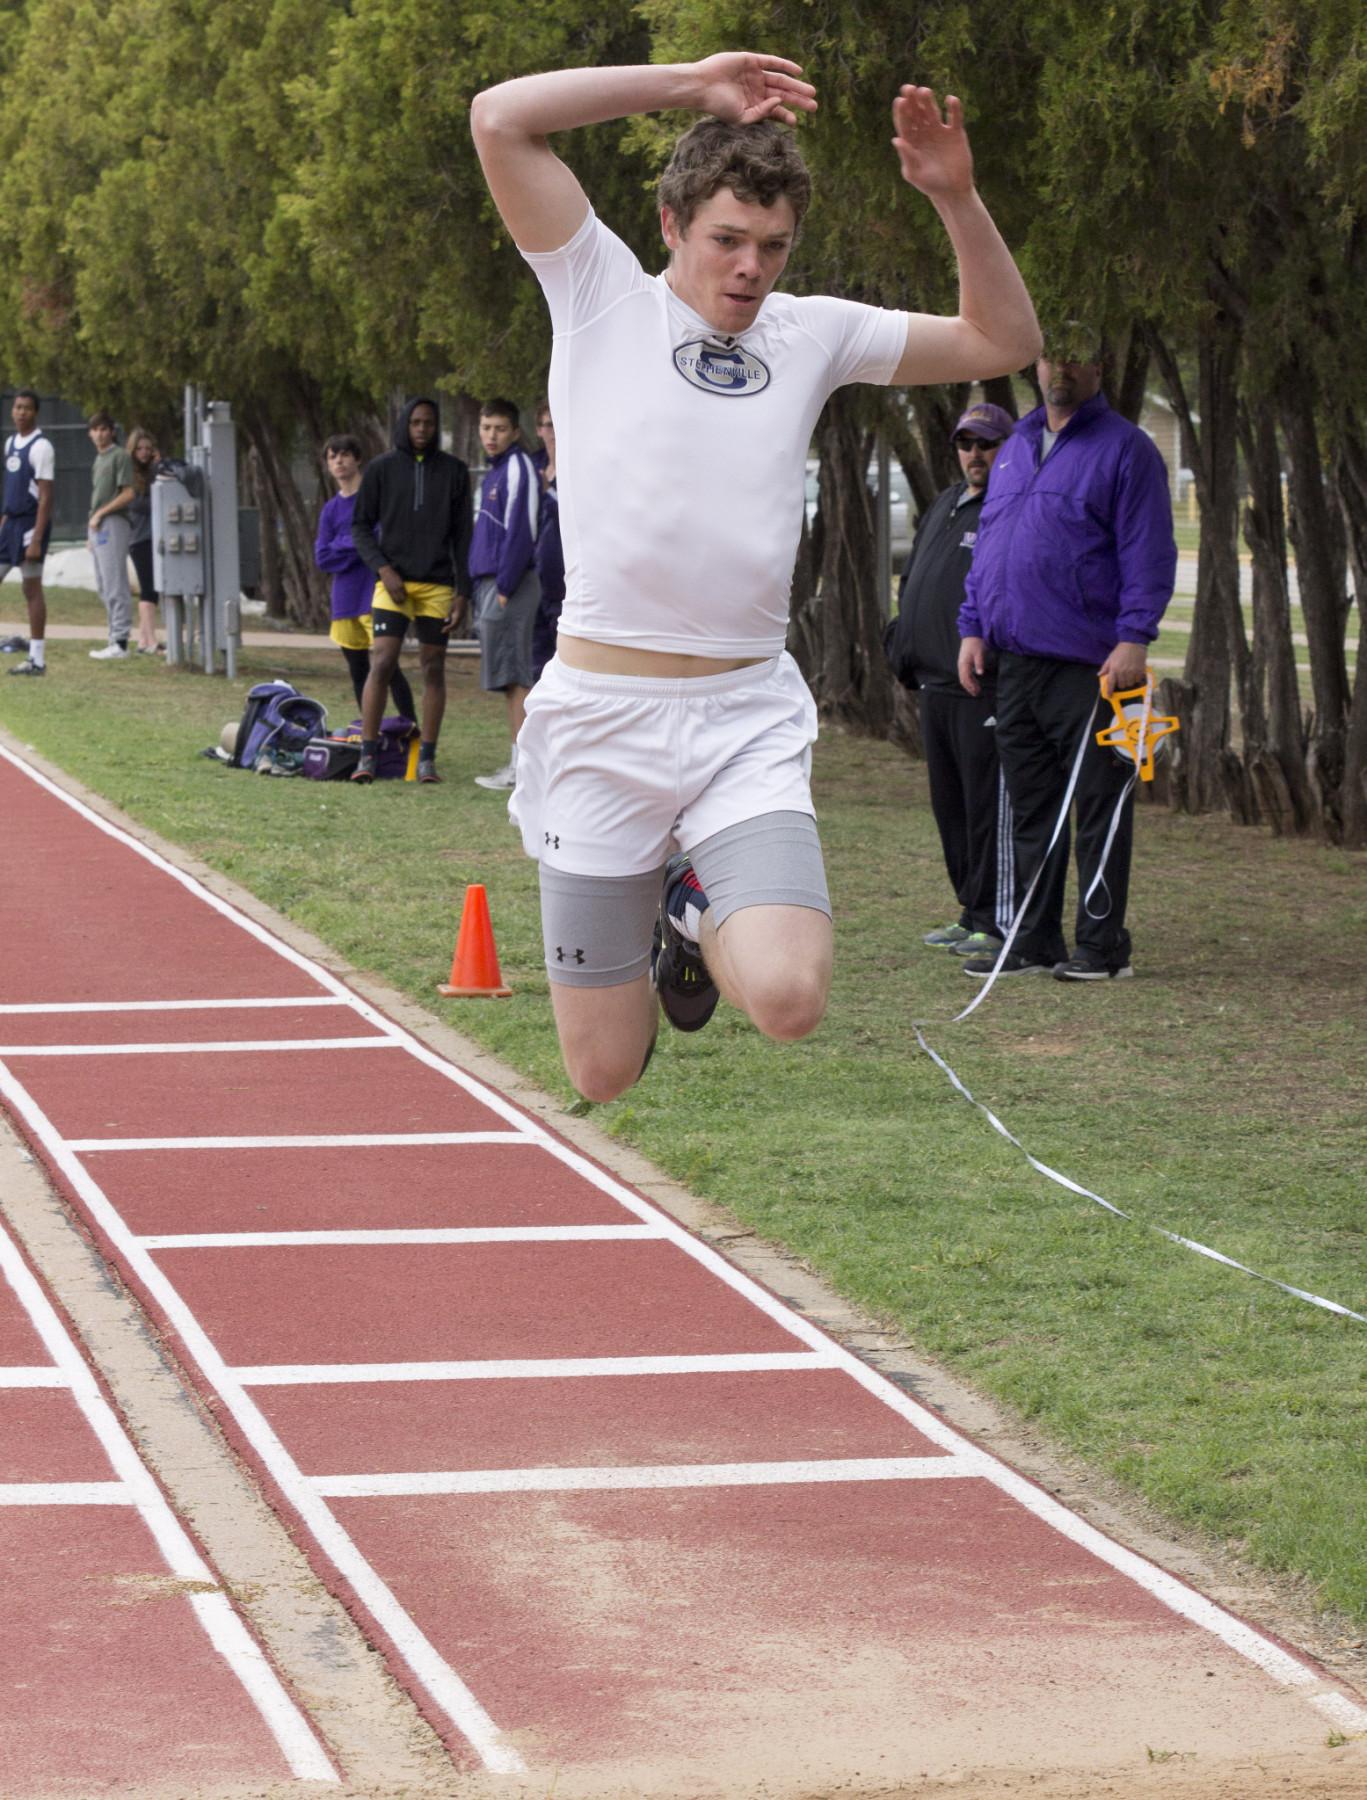 Josh Nowell jumping